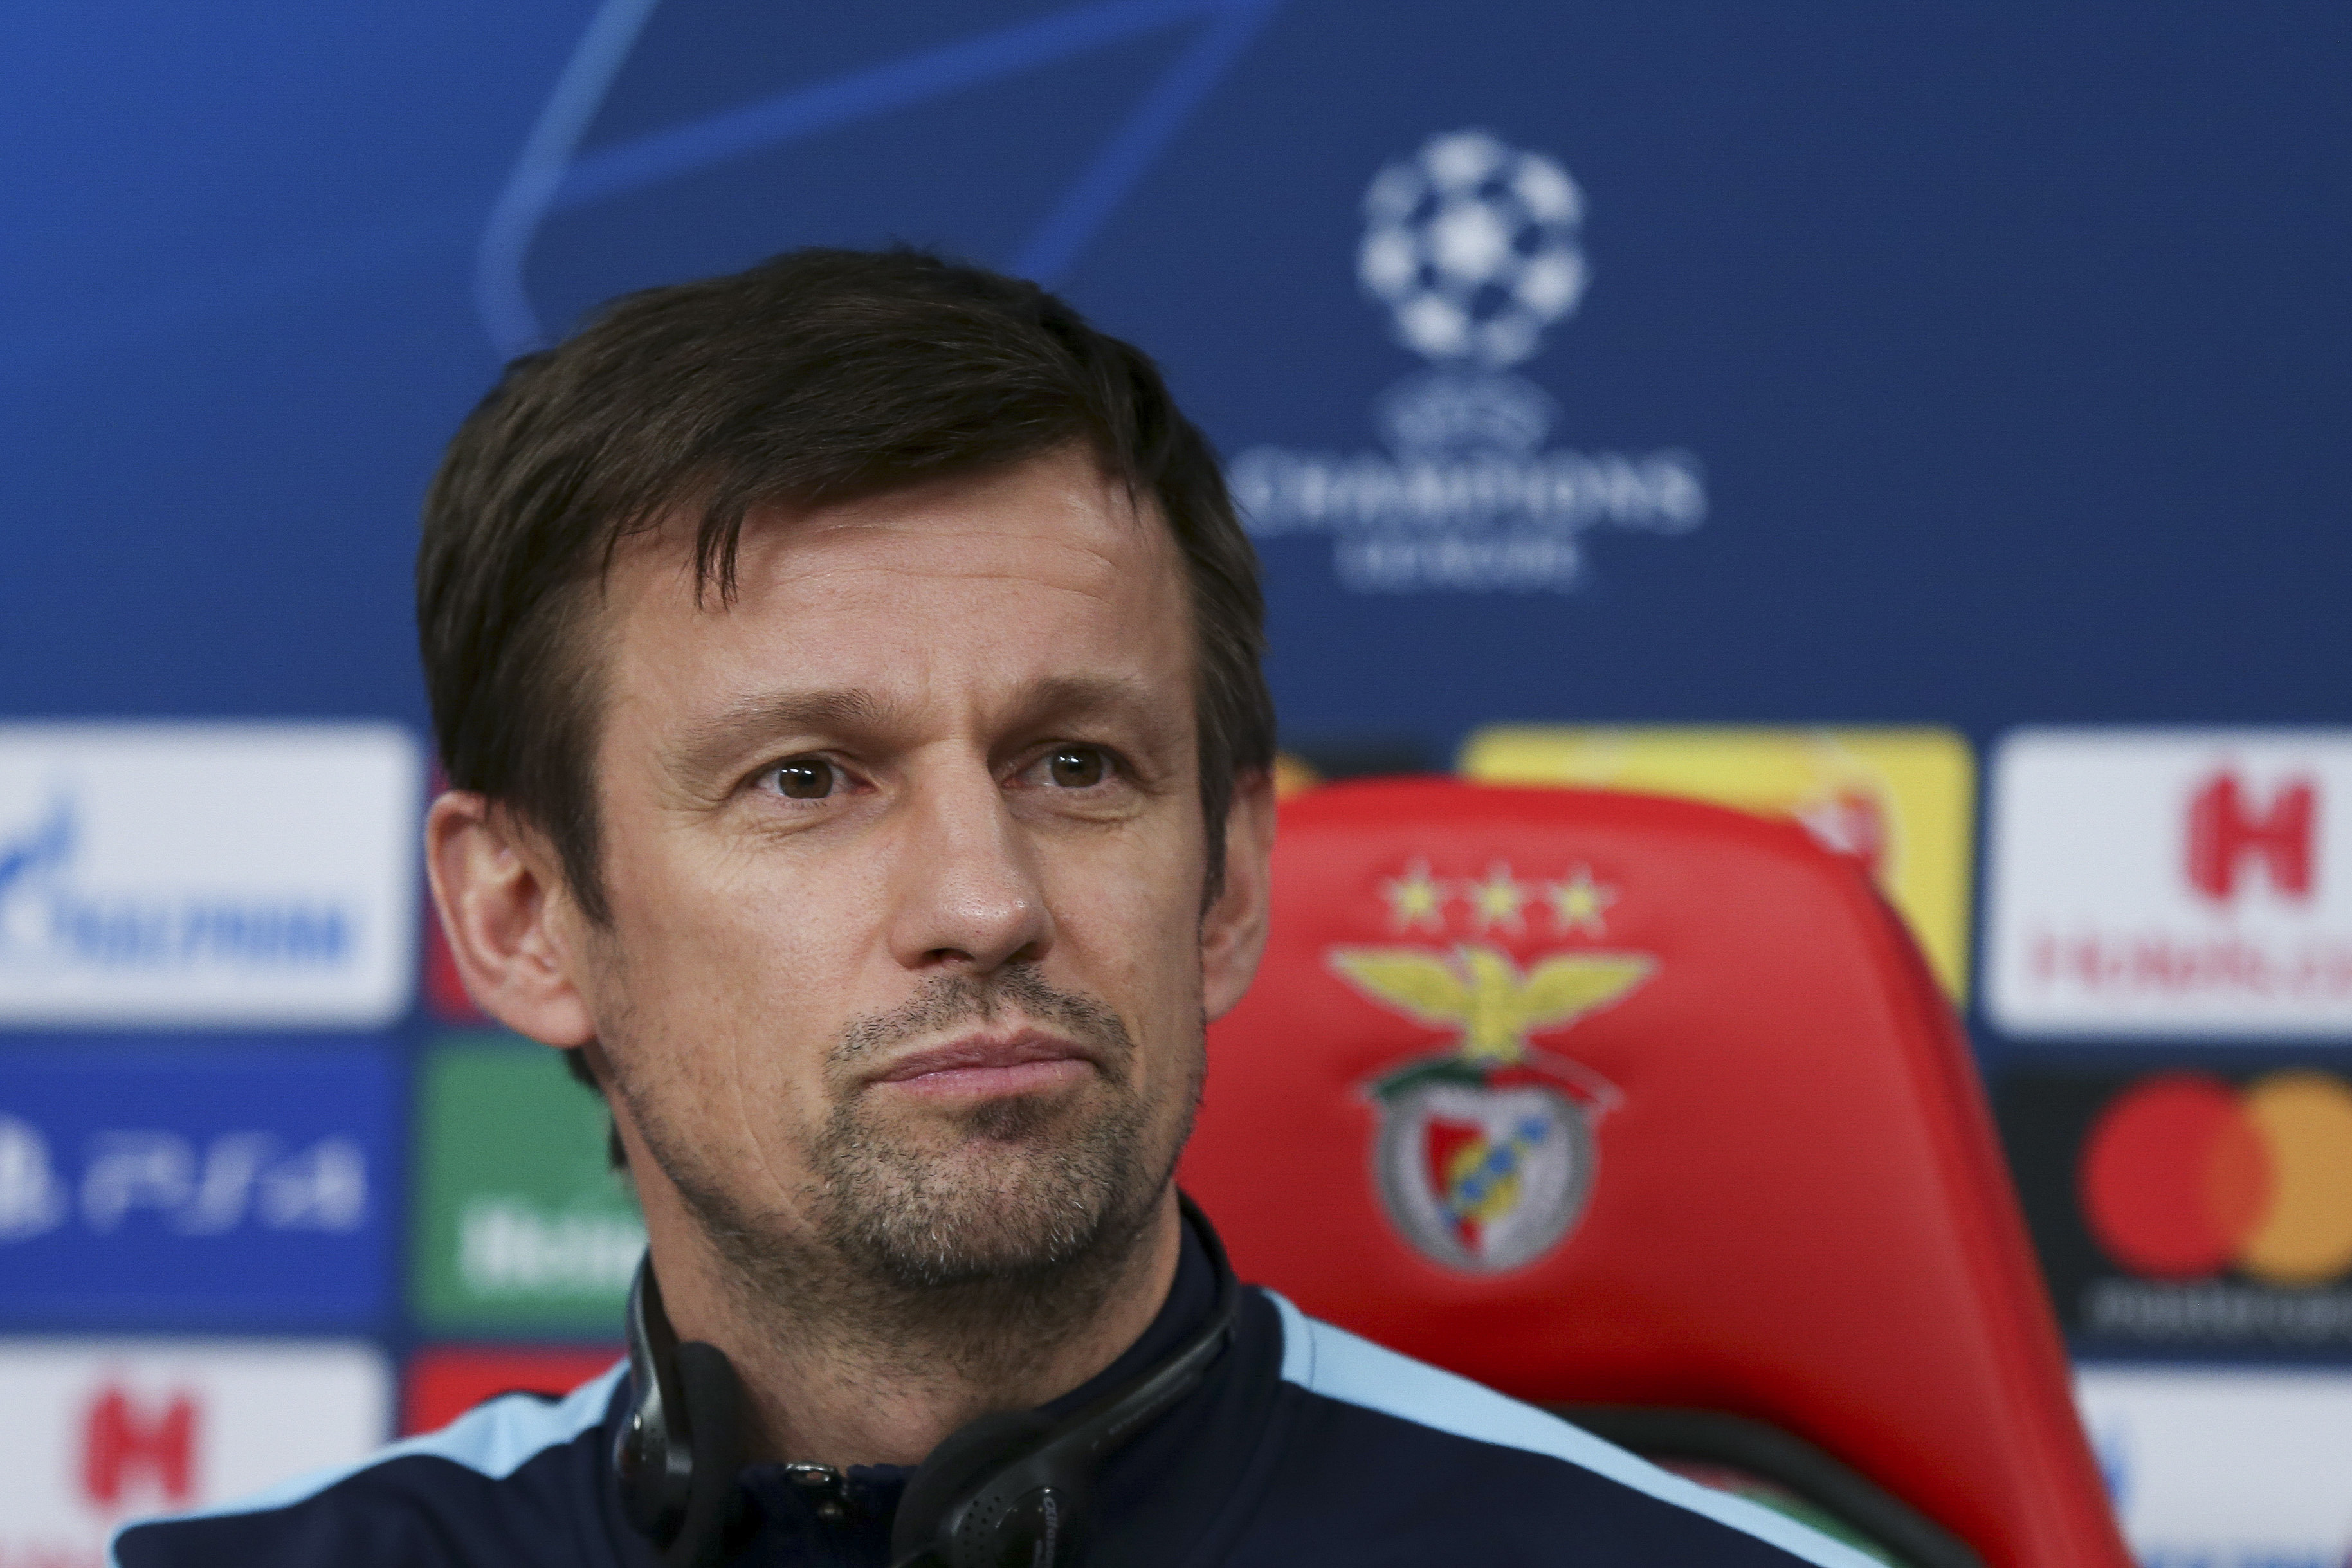 Zenit quer vencer Benfica para agarrar um lugar nos 'oitavos' da 'Champions'